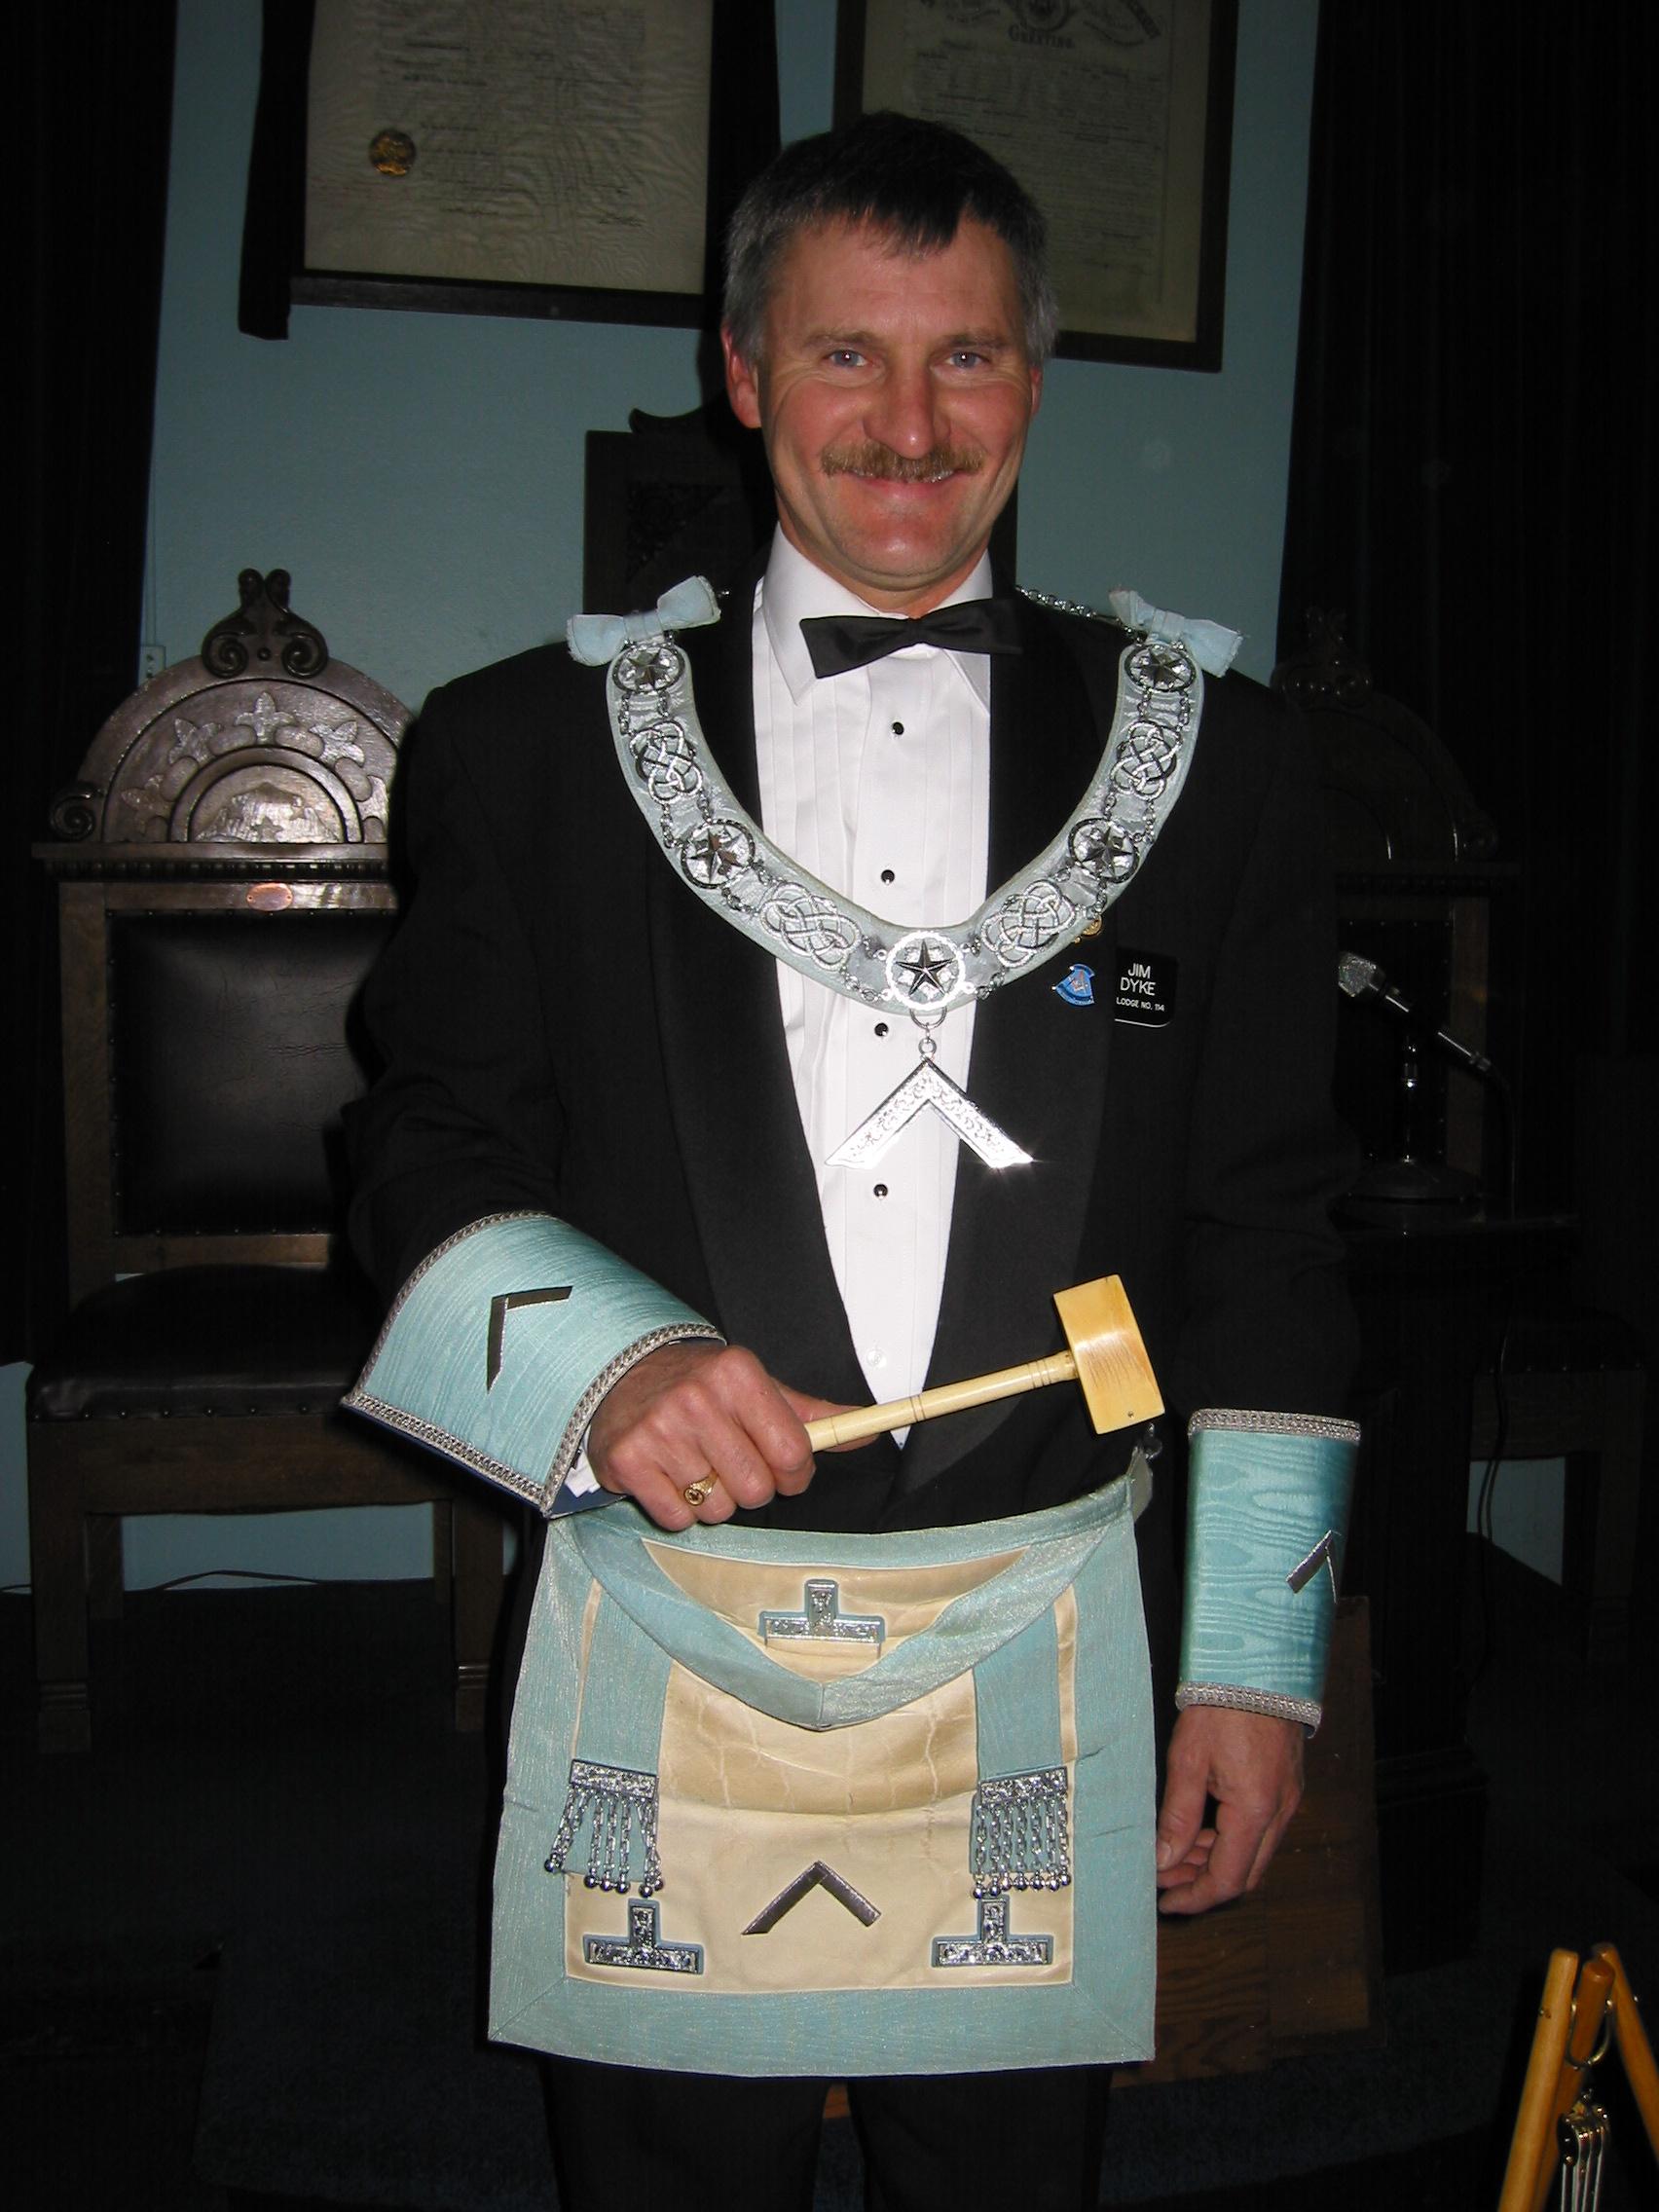 Daniel James Dyke 2008 - 09